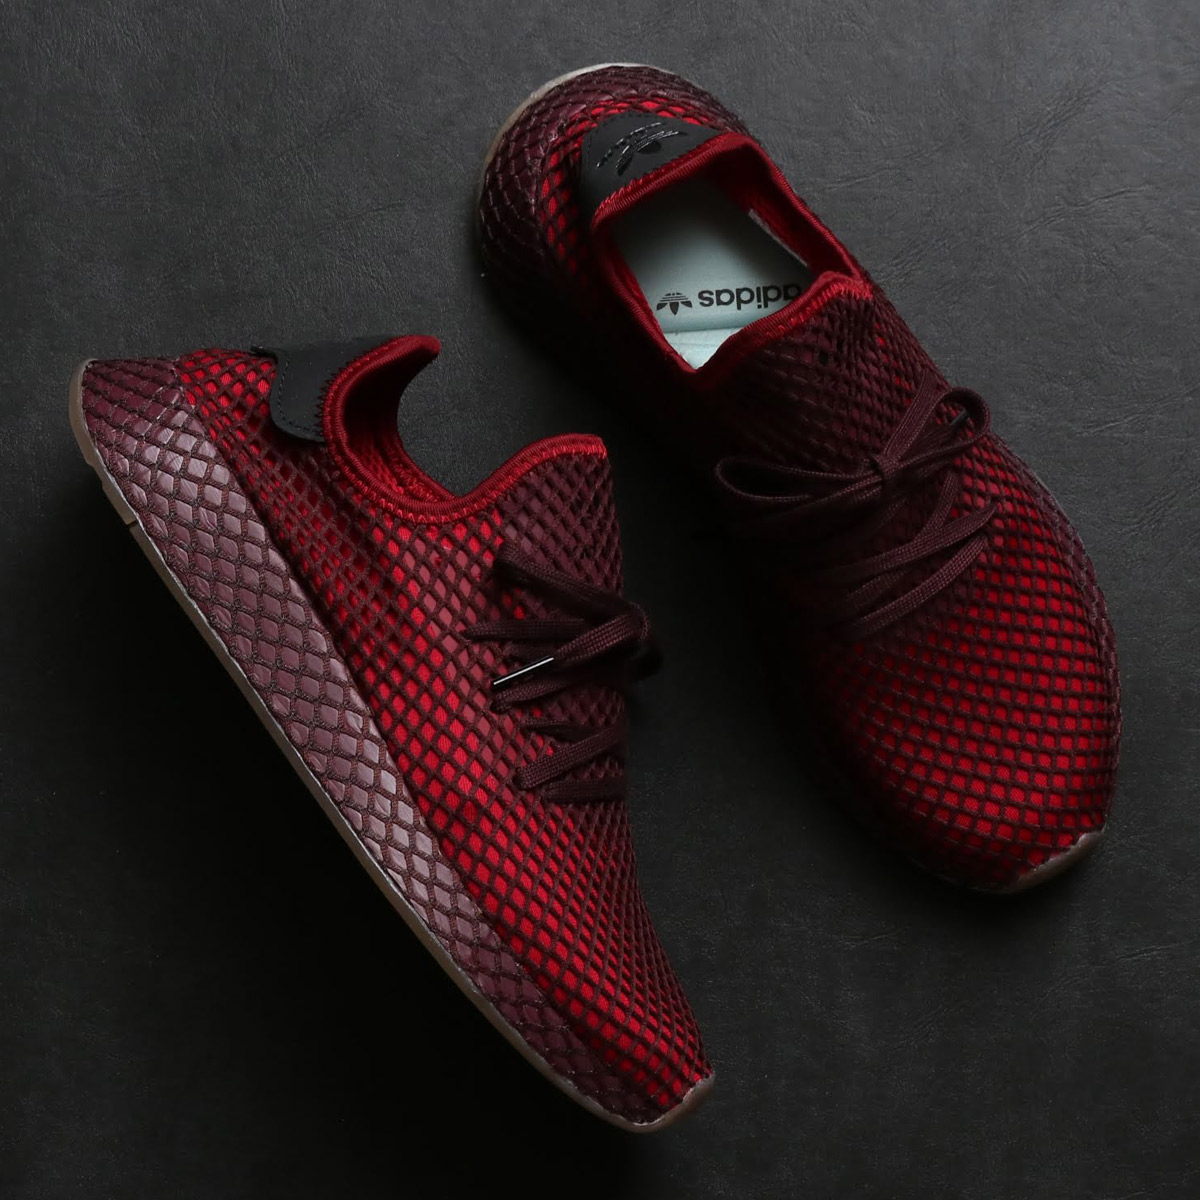 sports shoes 4db46 0f1b5 atmos pink adidas Originals DEERUPT RUNNER (Adidas originals D - ラプトランナー)  COLLEGEATE BURGUNDYCOLLEGEATE BURGUNDYASH GREEN 18FW-I  Rakuten Global  ...